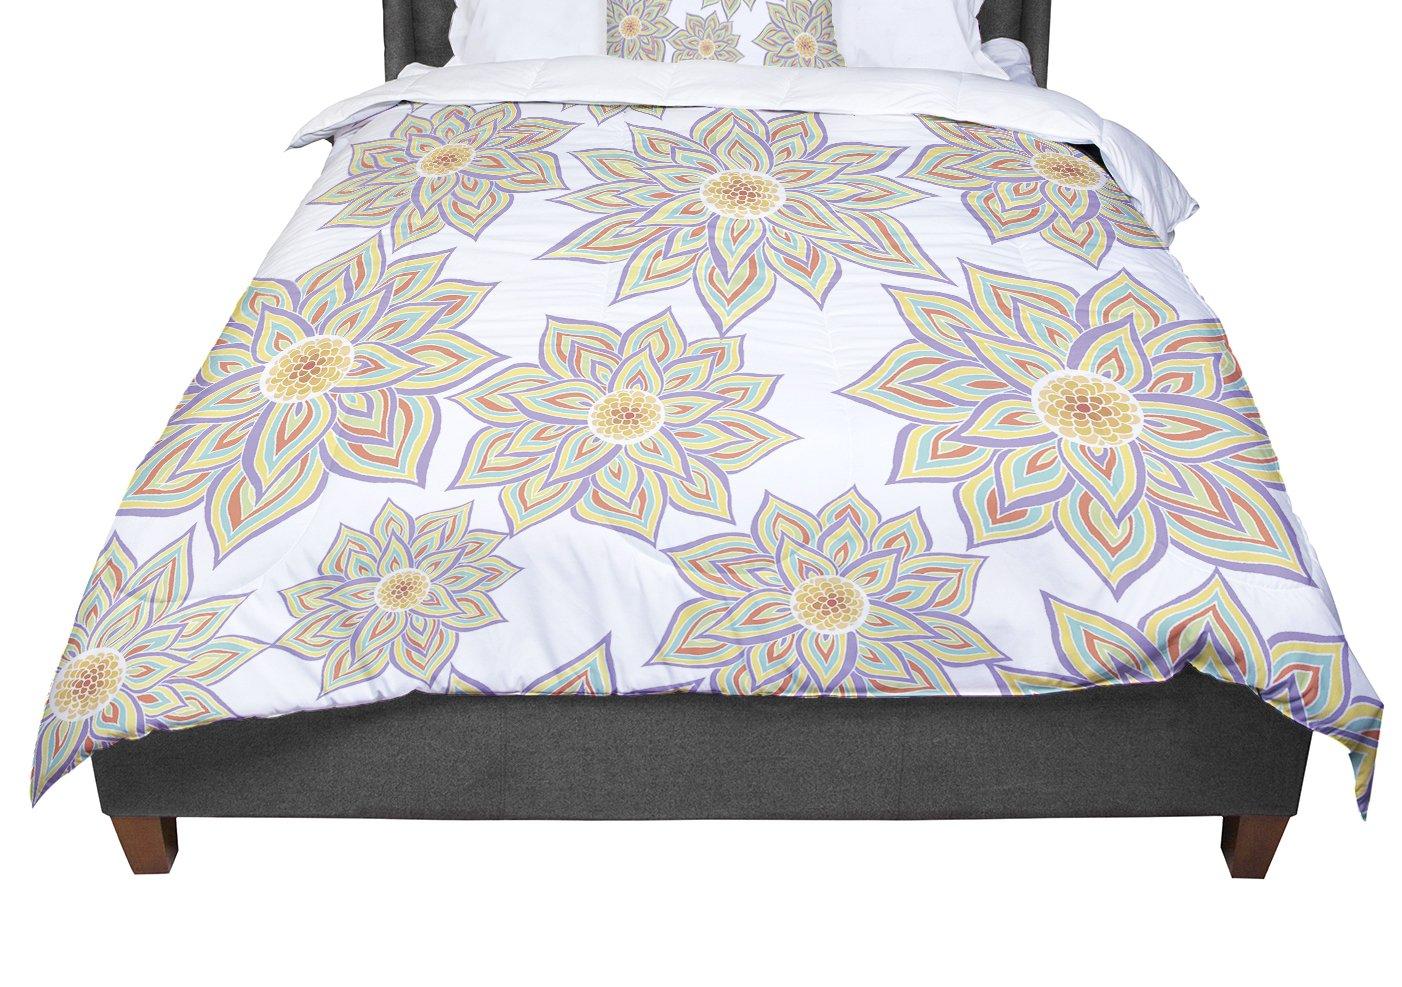 KESS InHouse Pom Graphic Design ''Floral Dance'' King / Cal King Comforter, 104'' X 88''